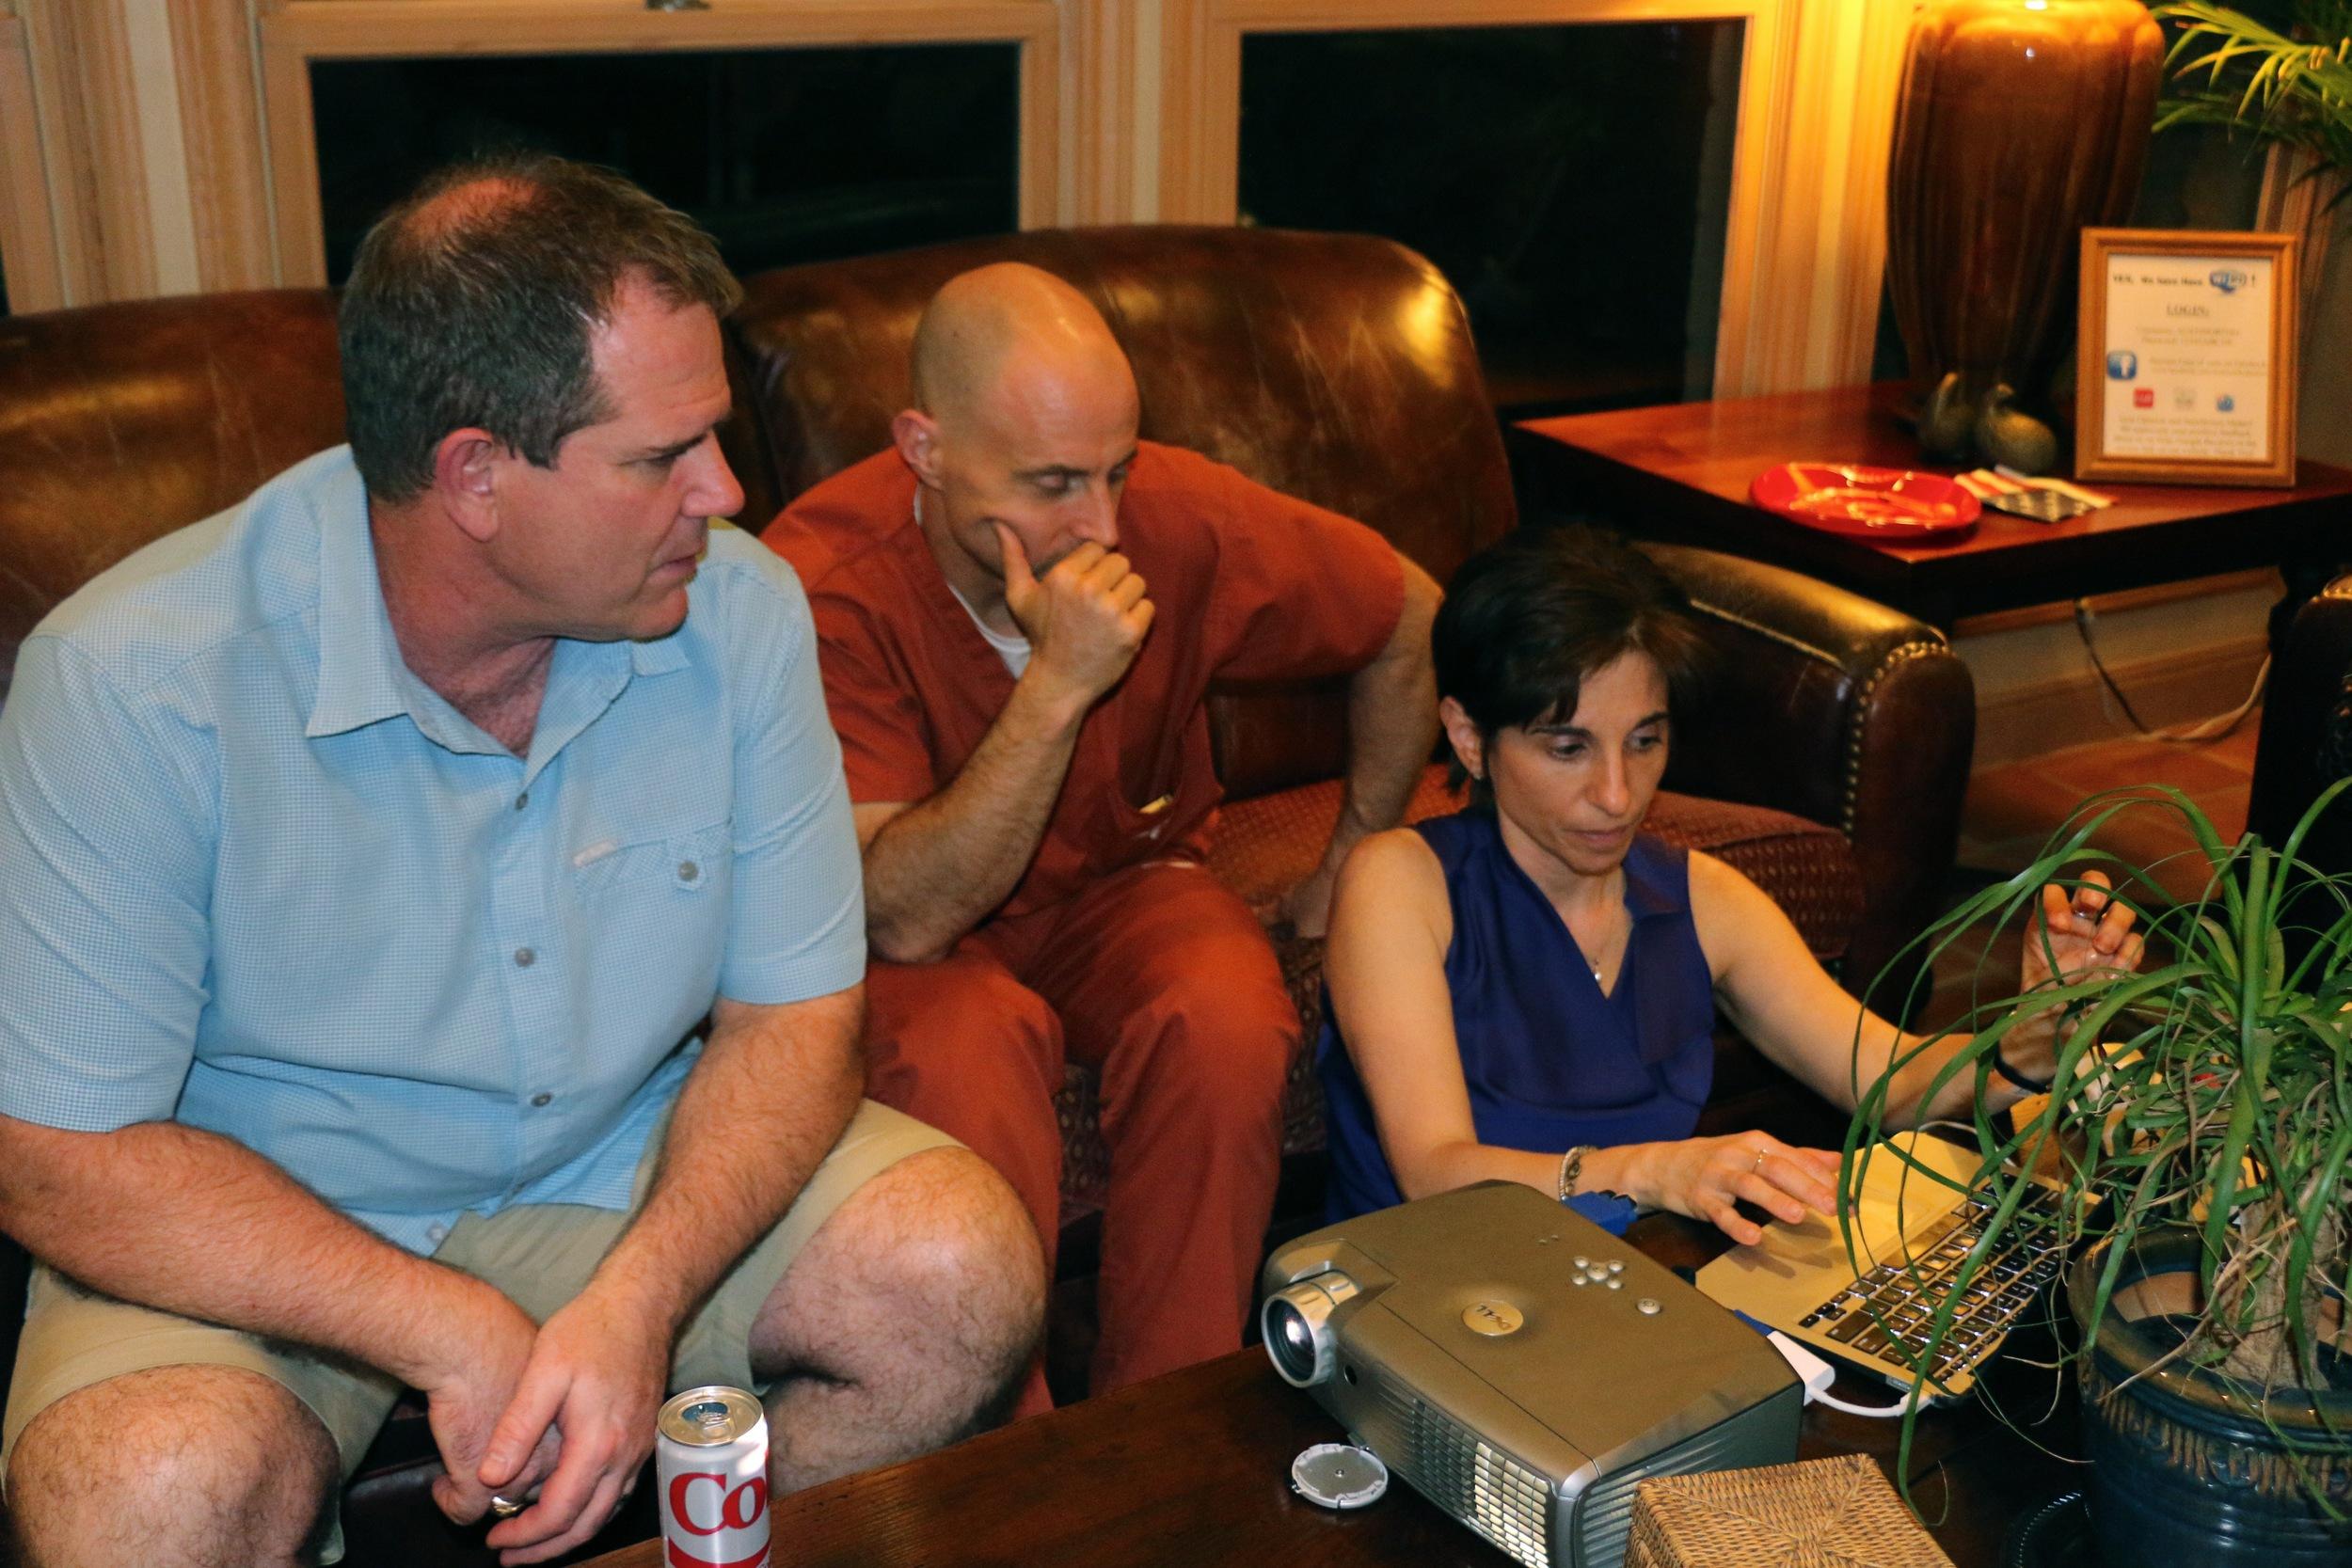 Drs. David Hime, Nick Salome and Monica Goldenberg